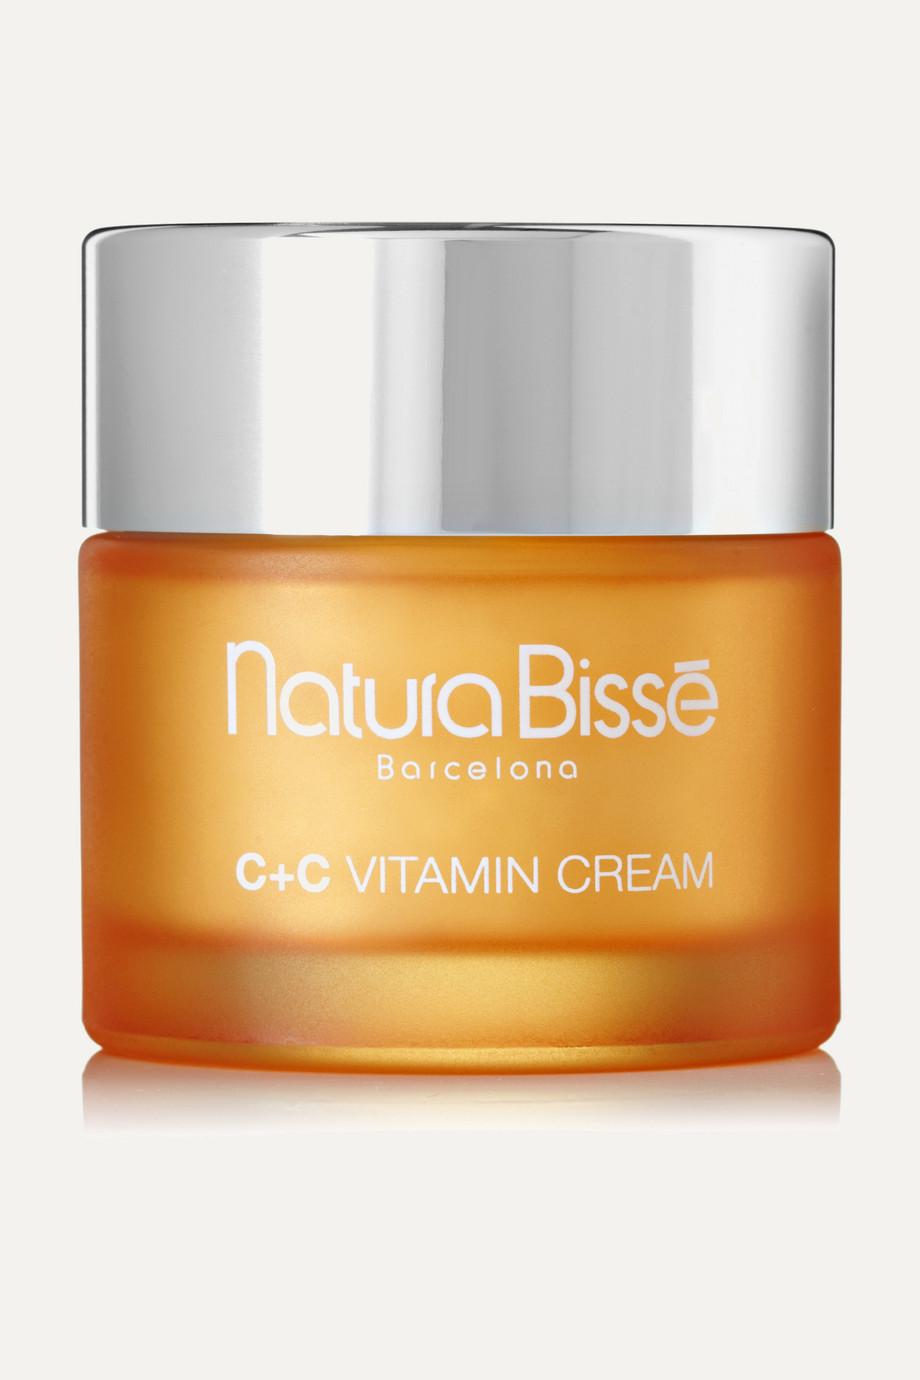 C+C Vitamin Cream Spf10, 75ml, by Natura Bissé